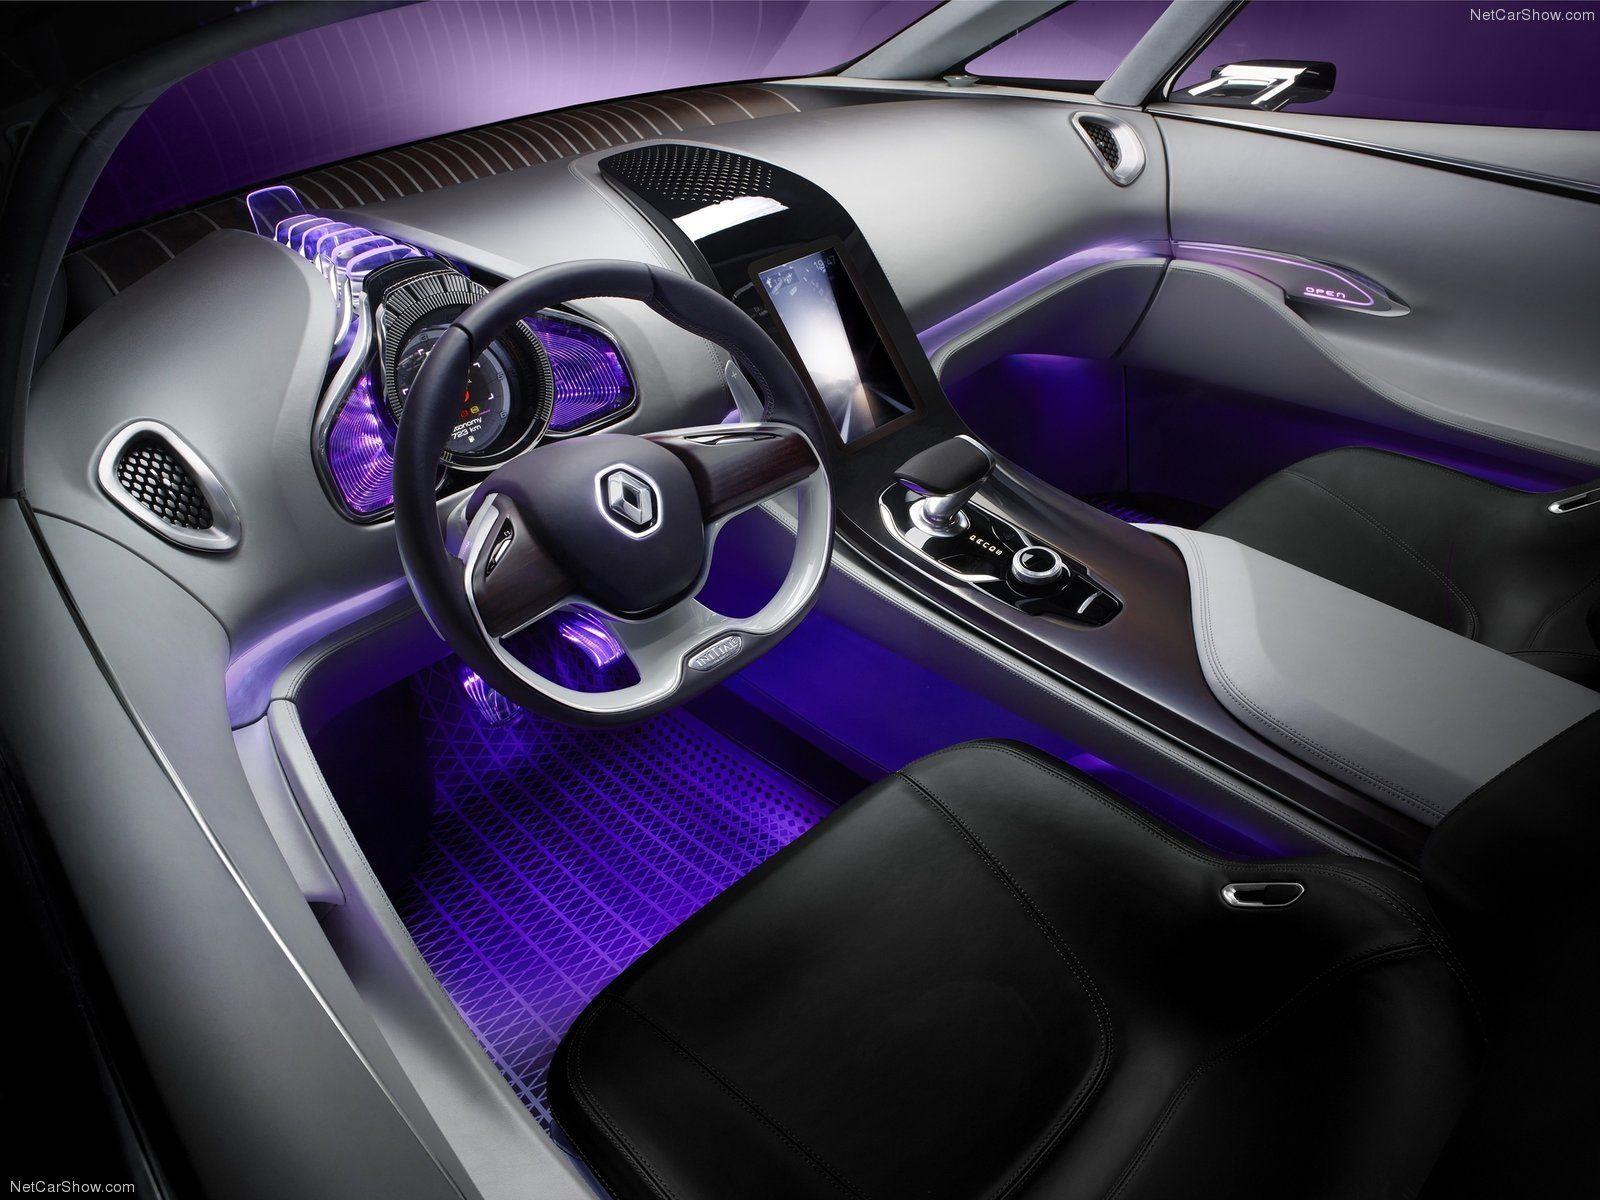 Renault Interior French Paris Car Seat Future Glass Purple